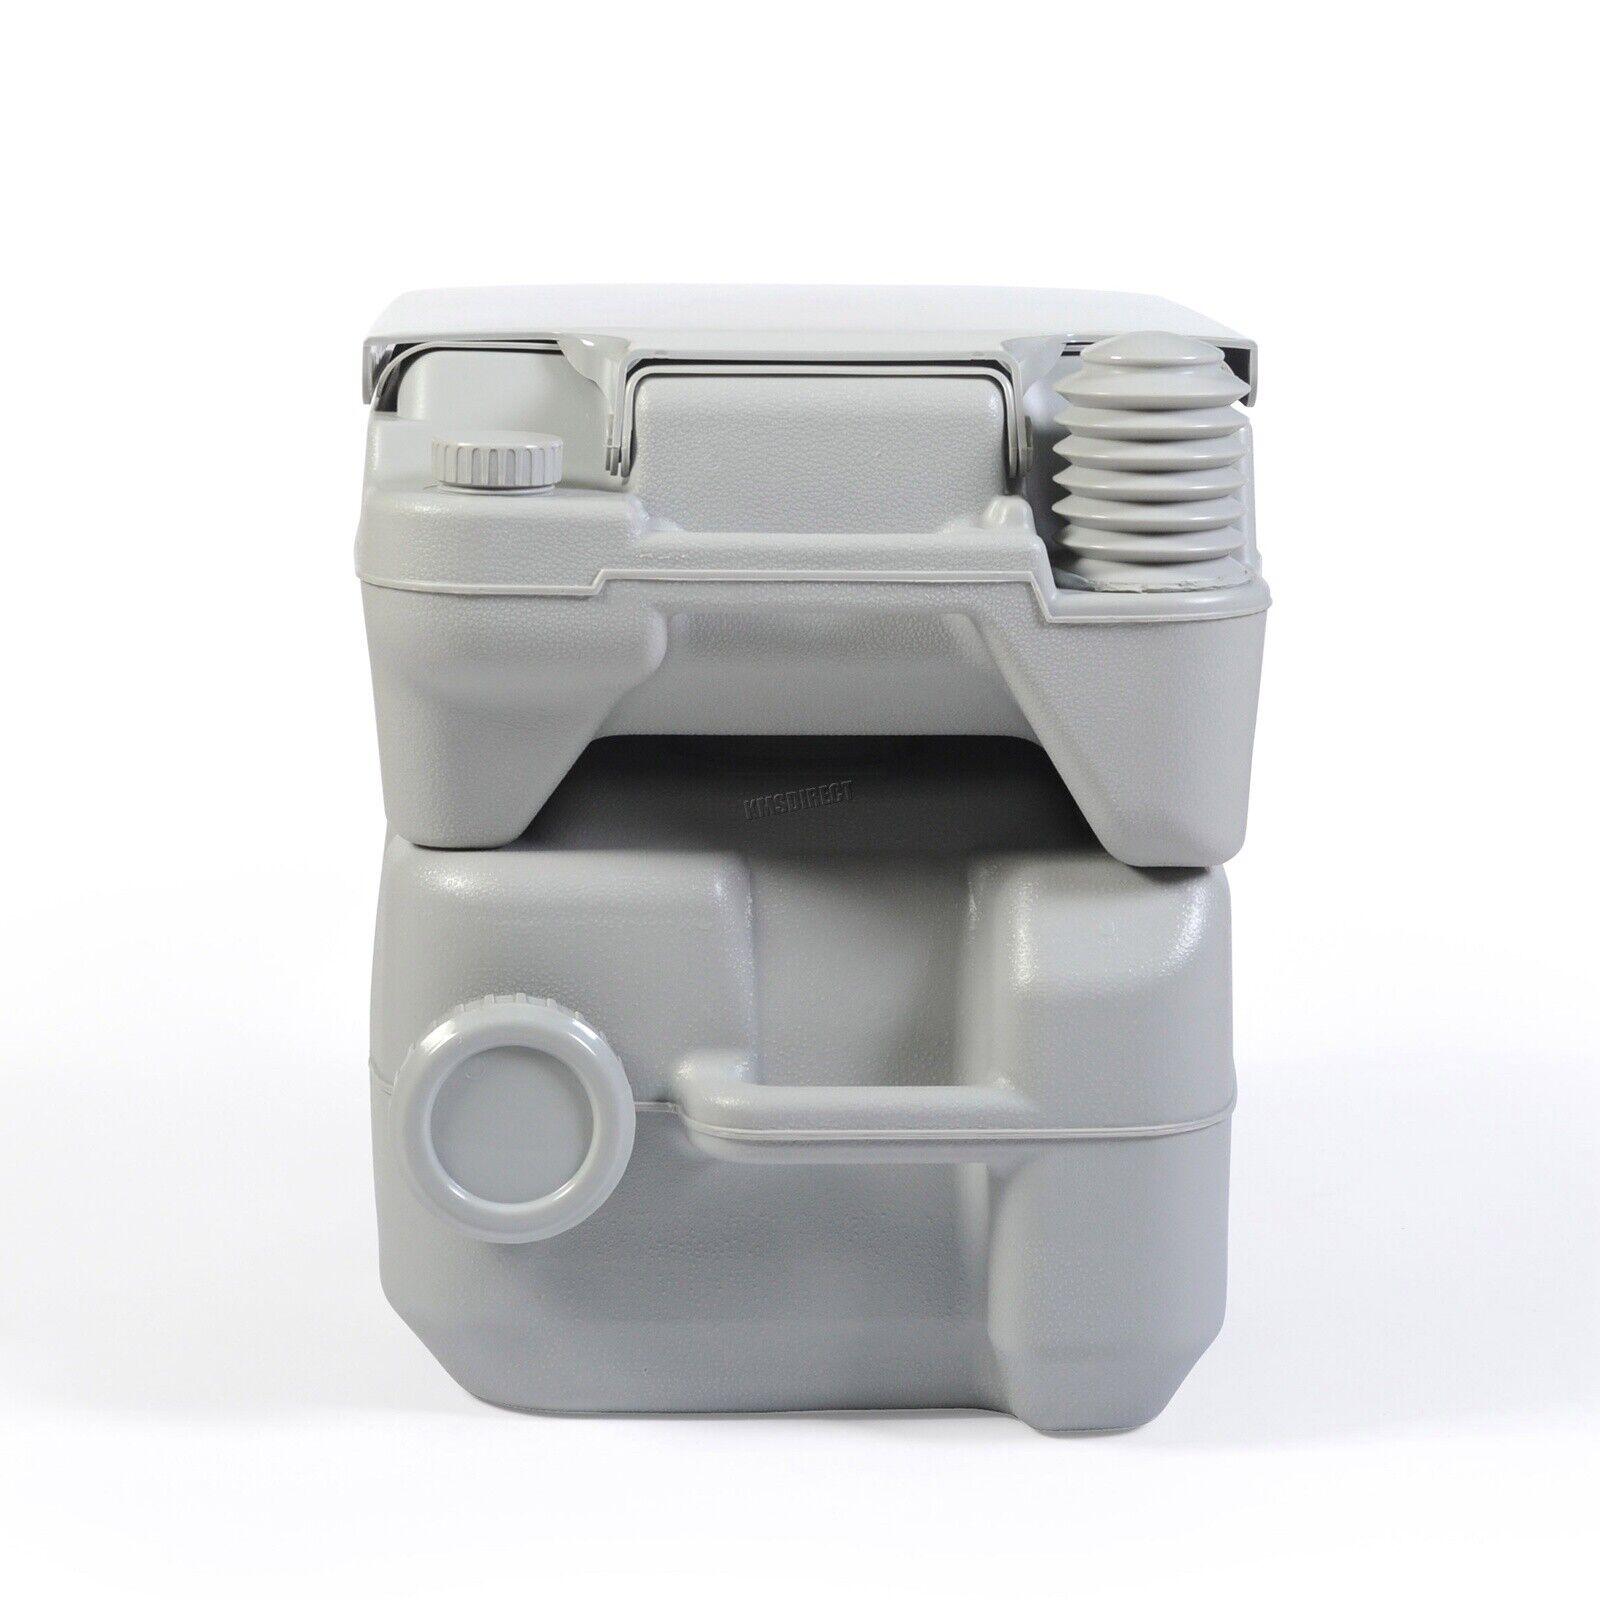 FoxHunter 20L Portable Toilet Flush Caravan Camping Travel WC Loo Porta Potty 8